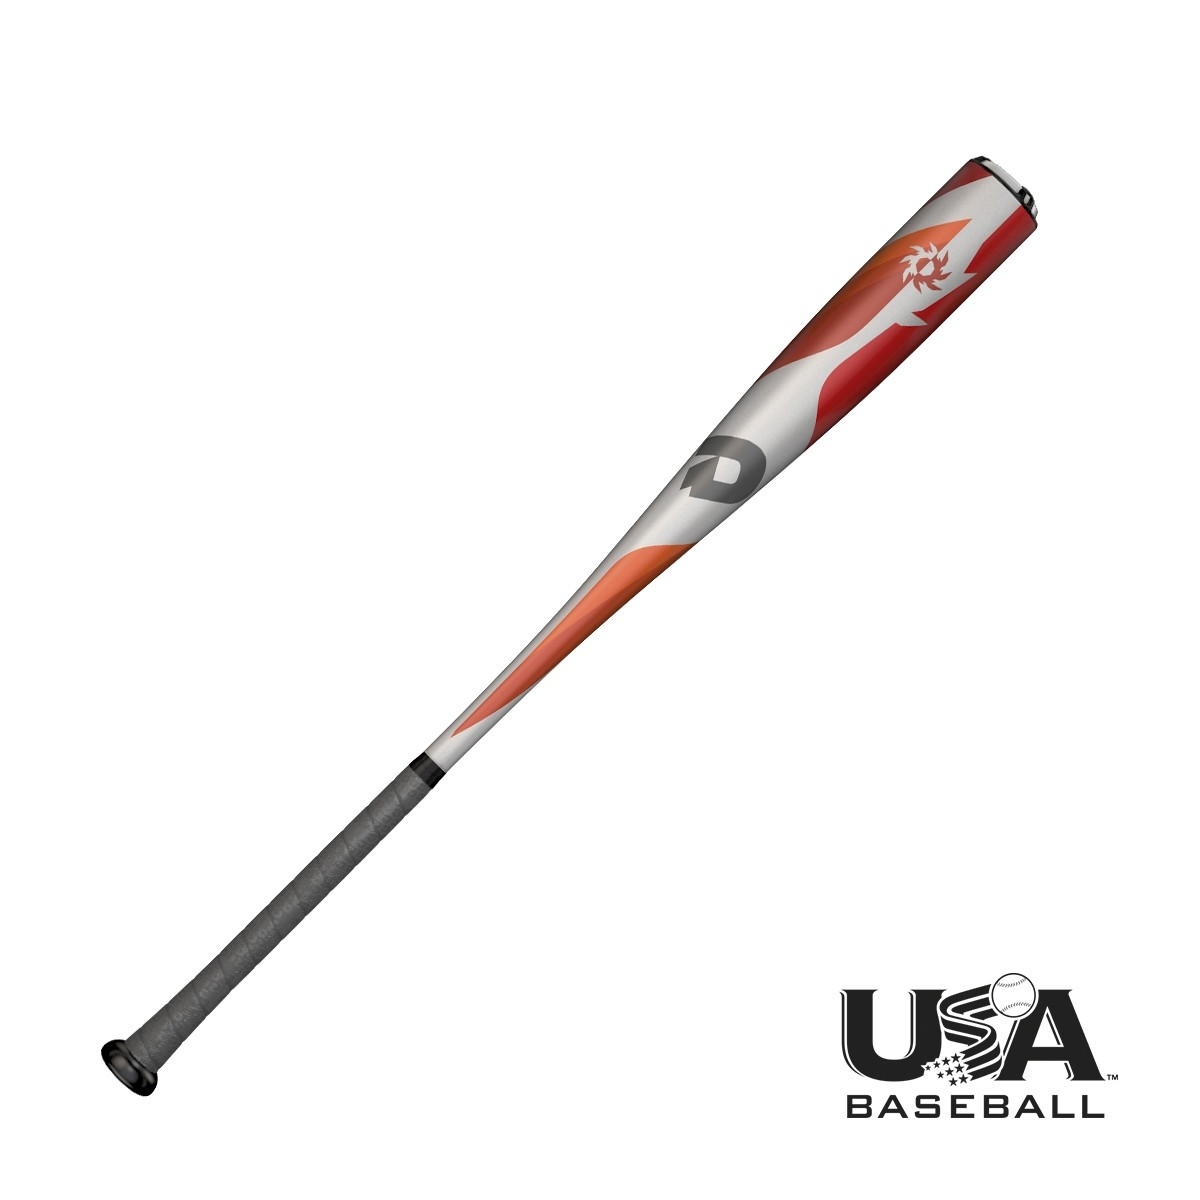 demarini-2018-voodoo-one-10-2-5-8-balanced-usa-baseball-bat-28-inch-18-oz WTDXUO21828-18 DeMarini 887768630027 `-10 length to weight ratio 2 5/8 inch barrel diameter Balanced